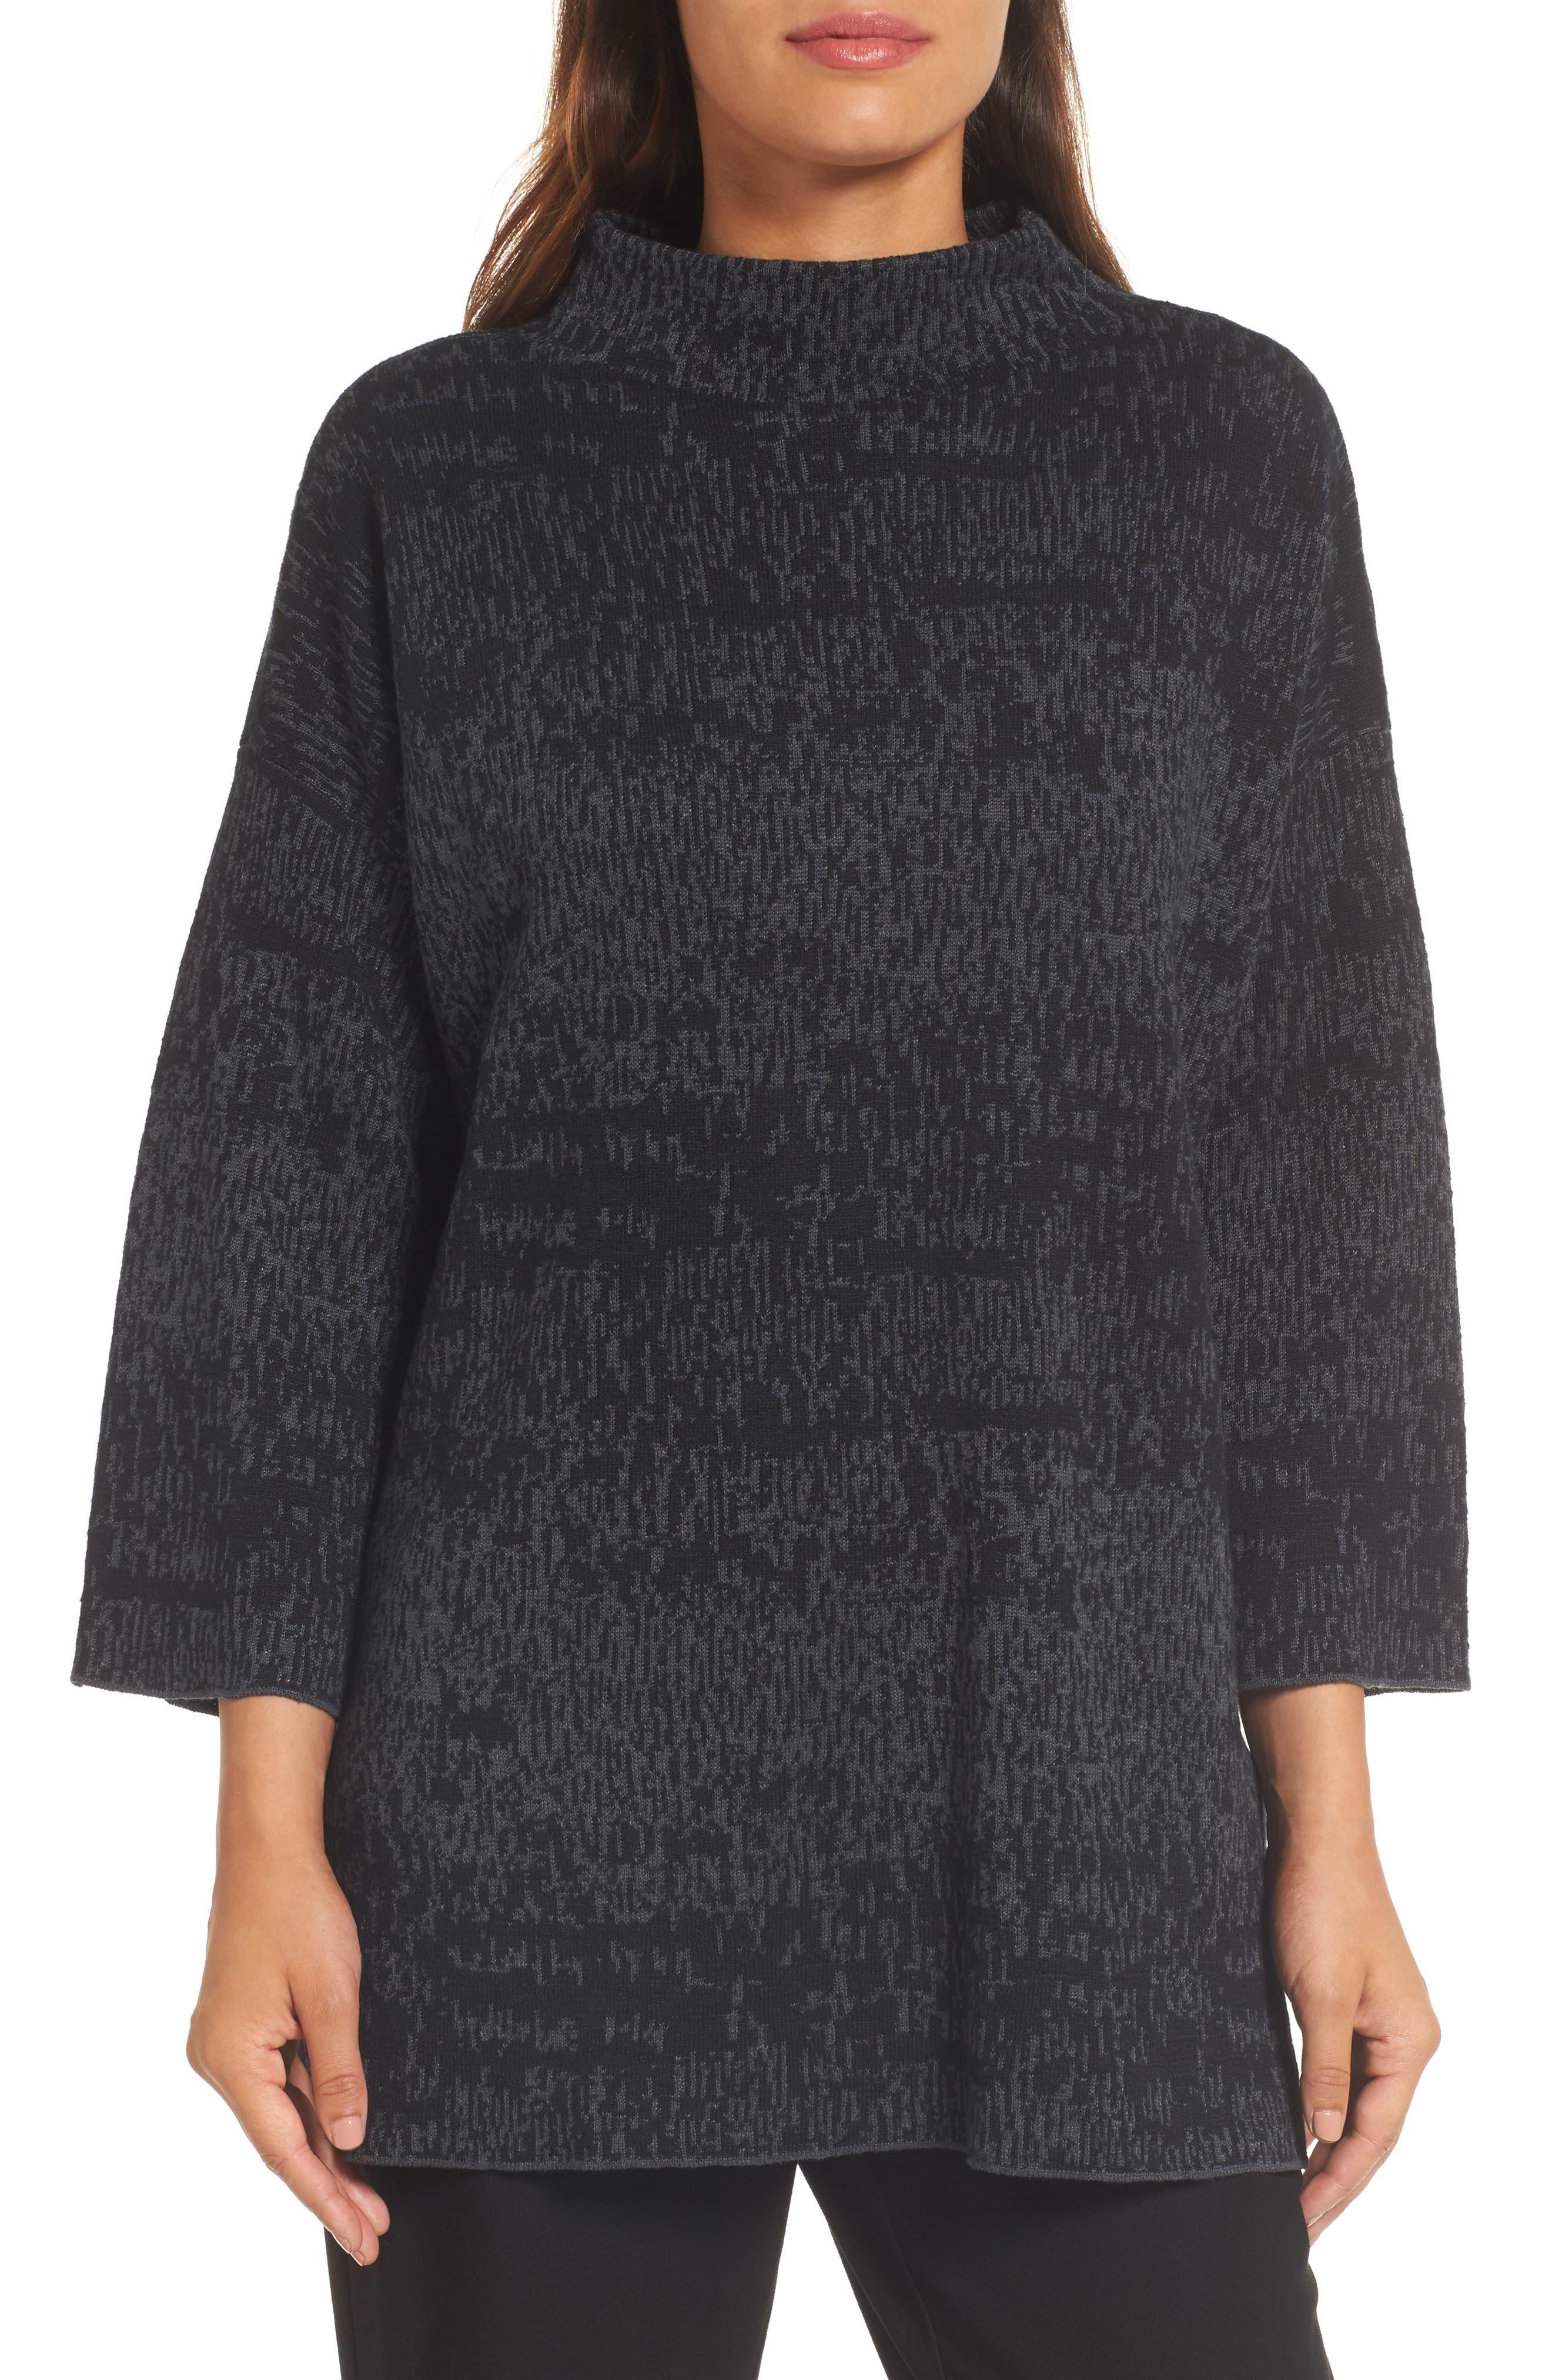 Alternate Image 1 Selected - Eileen Fisher Funnel Neck Organic Linen Blend Sweater